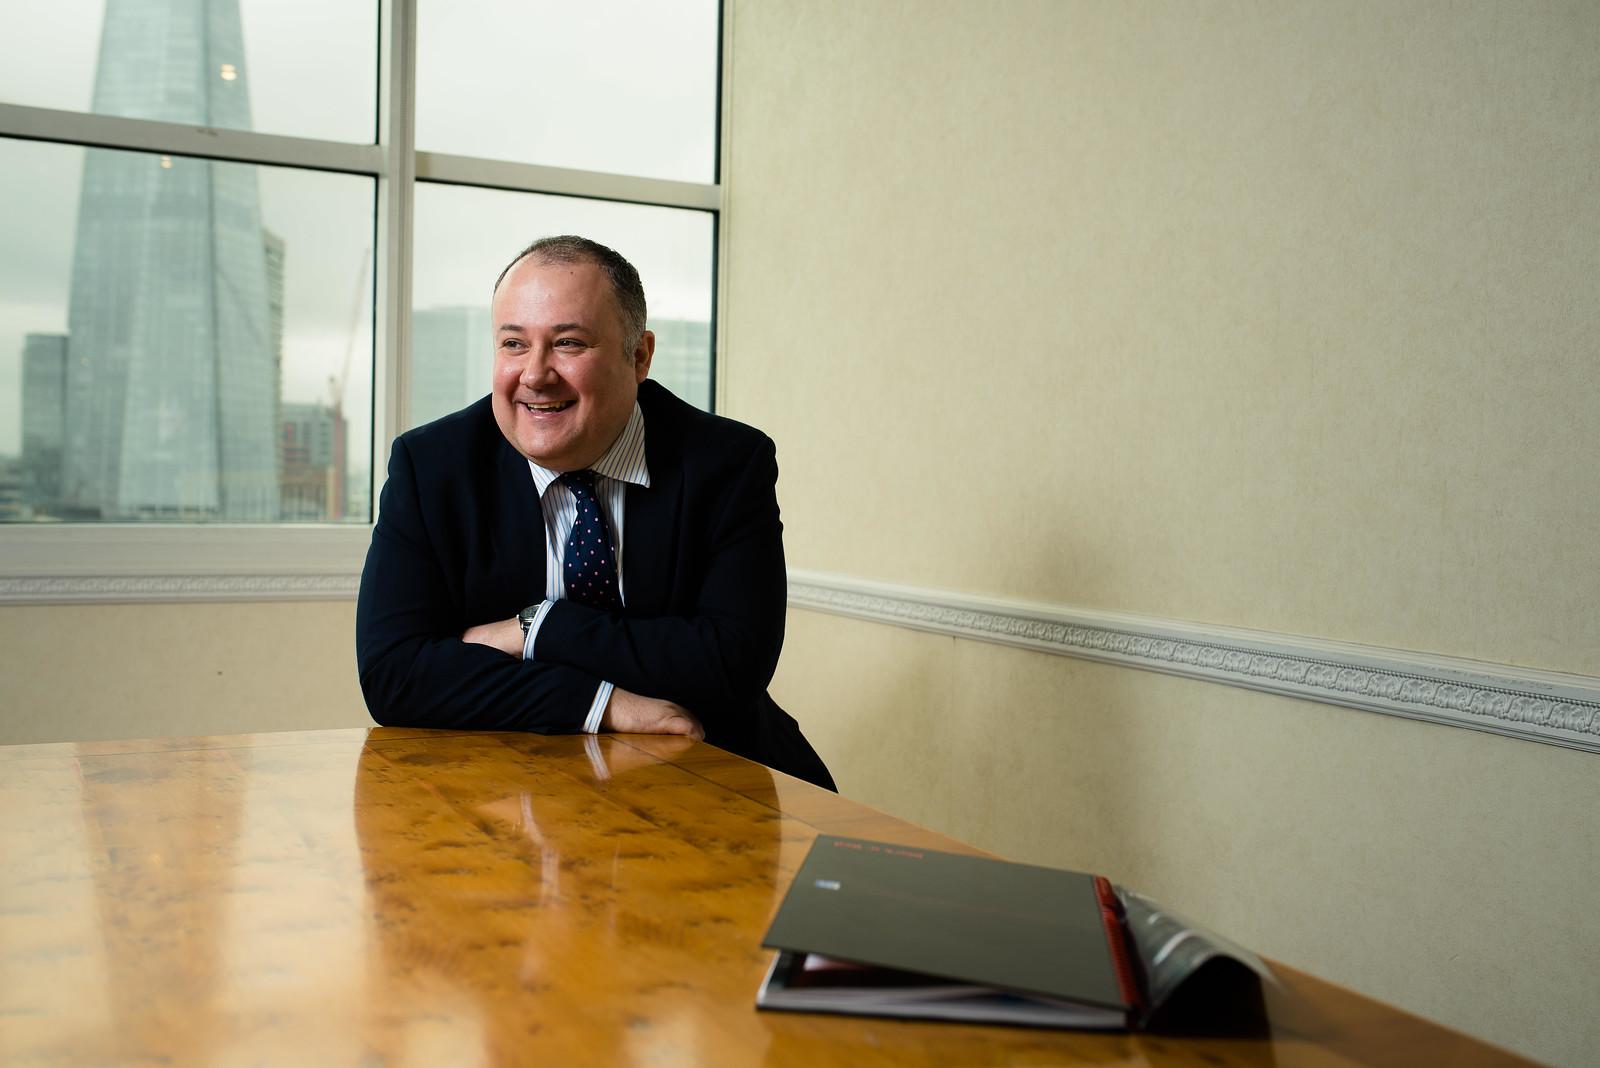 Stephen Rigley, Deputy Editor, Sunday Express